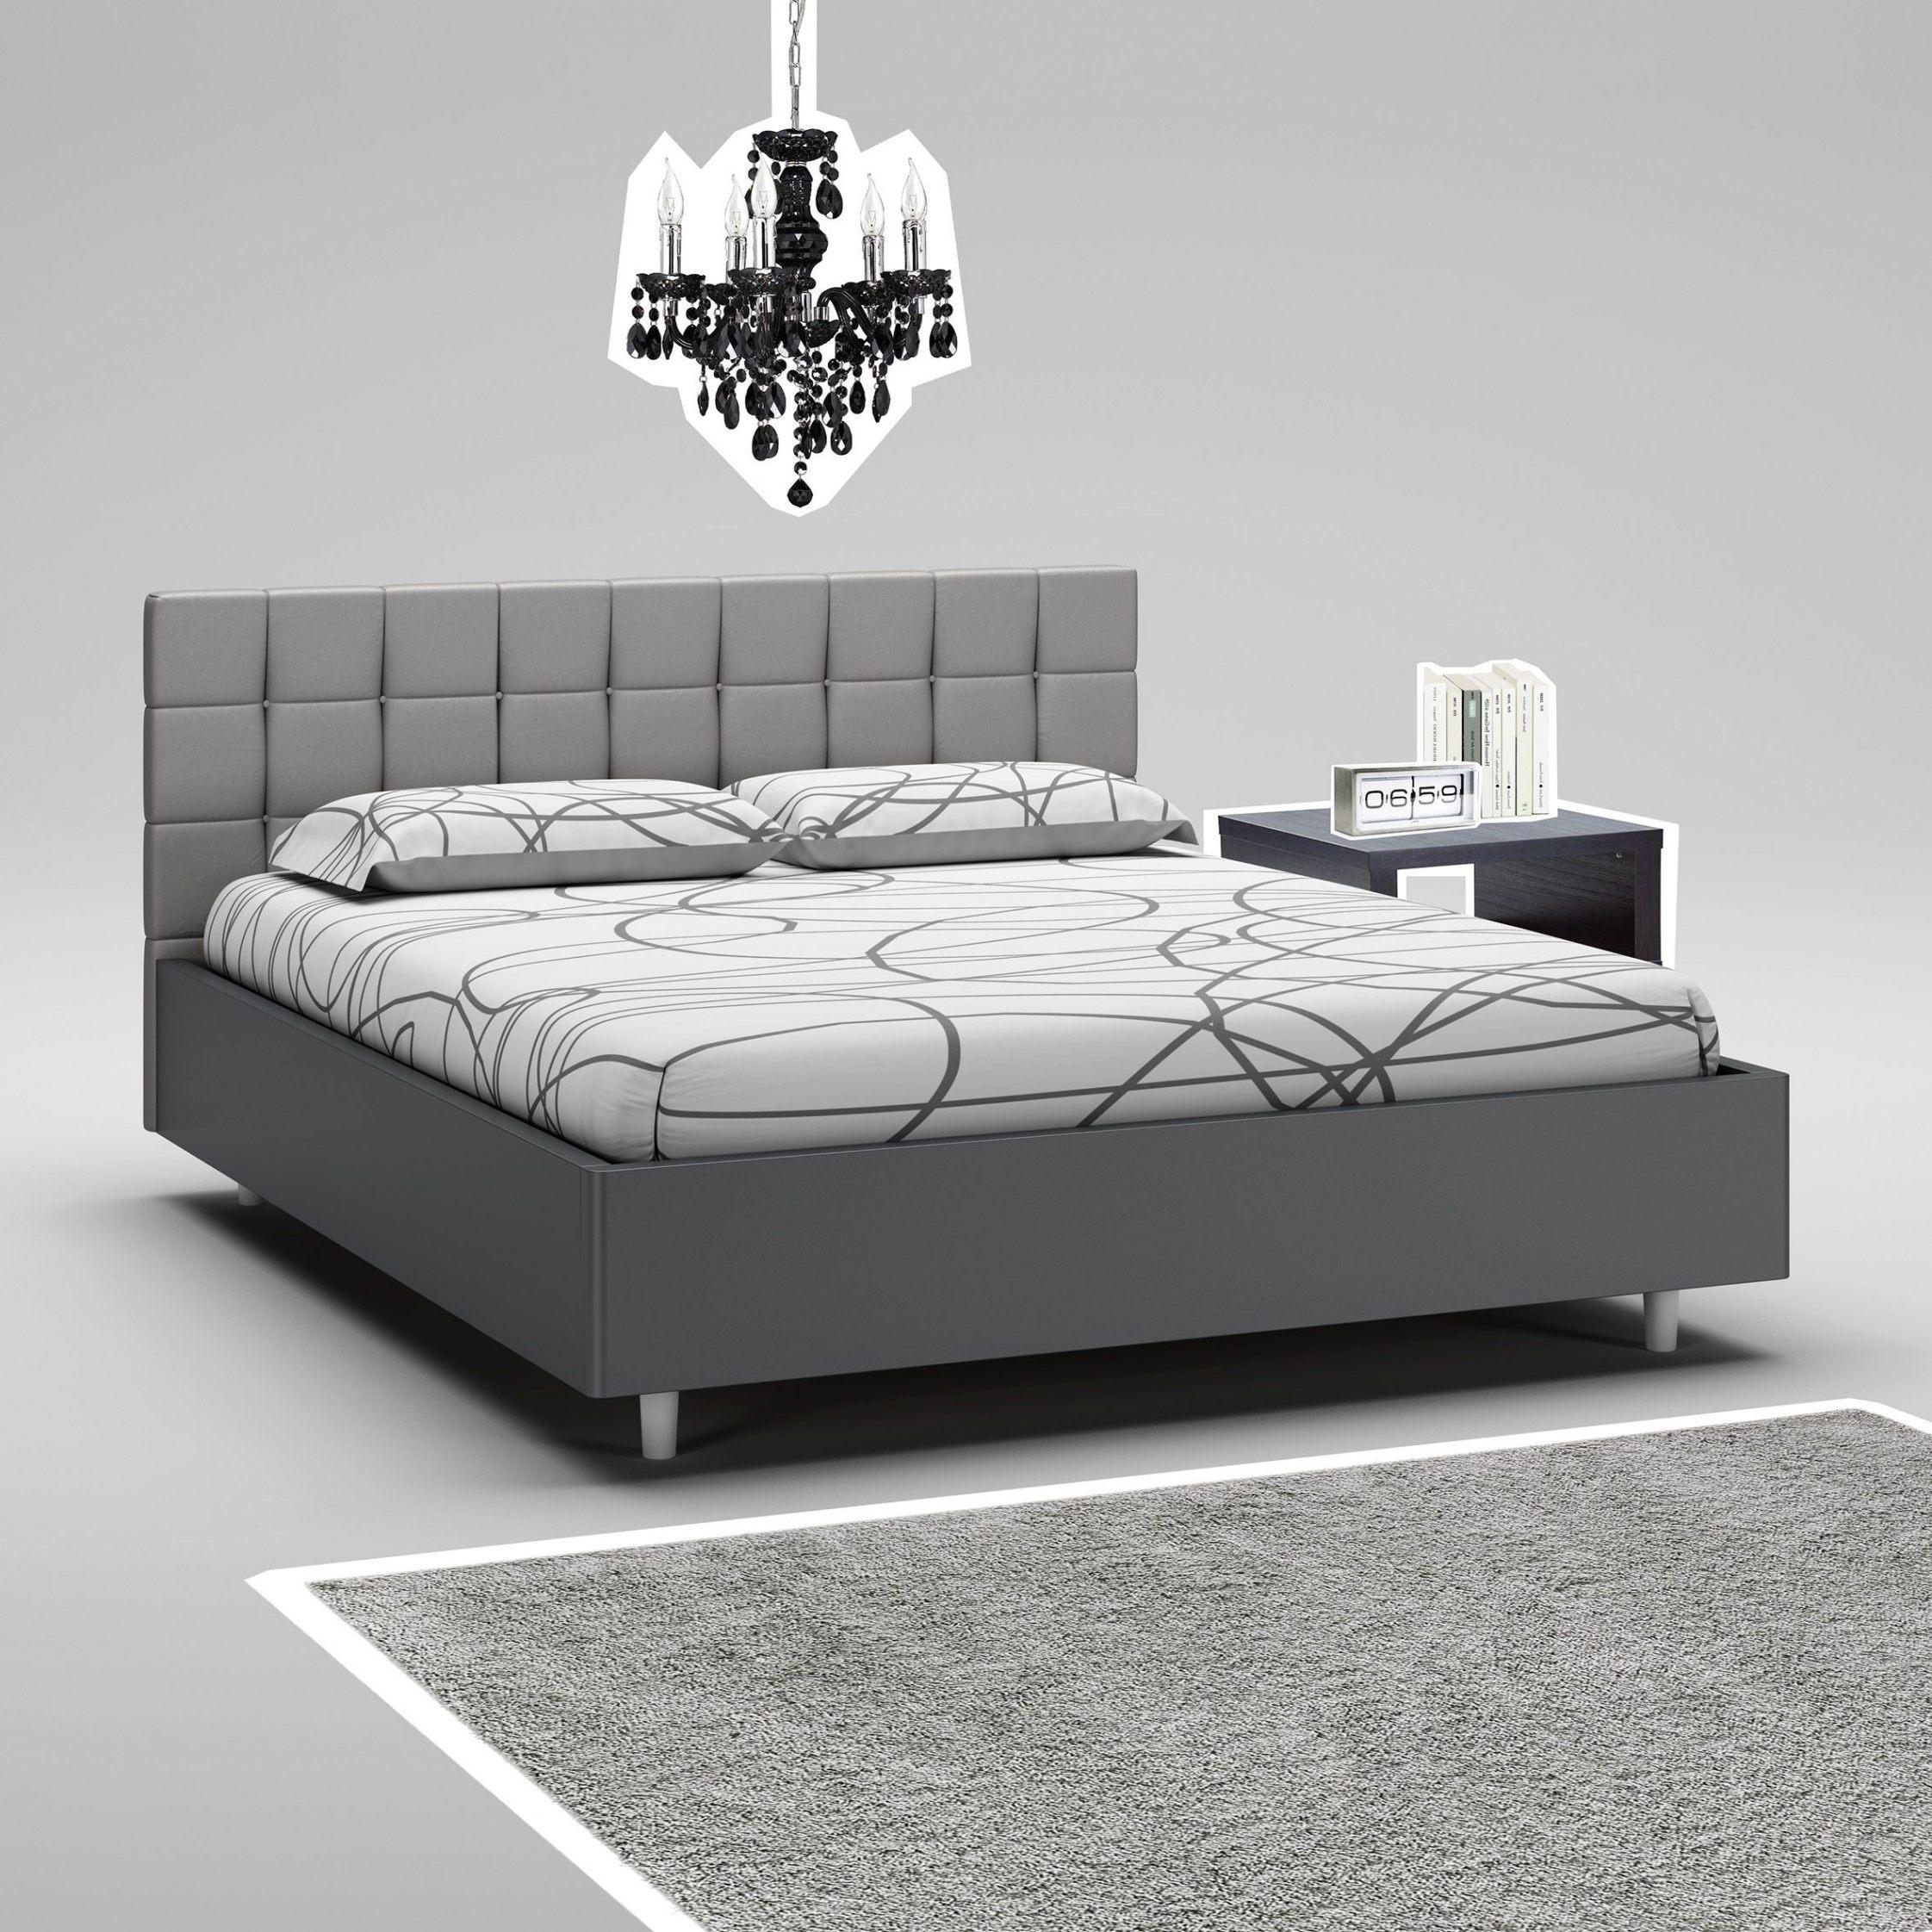 Bois De Lit 160×200 Belle Lit Design 160×200 160×200 Finest Lit X Led Lit Led Design Groupon